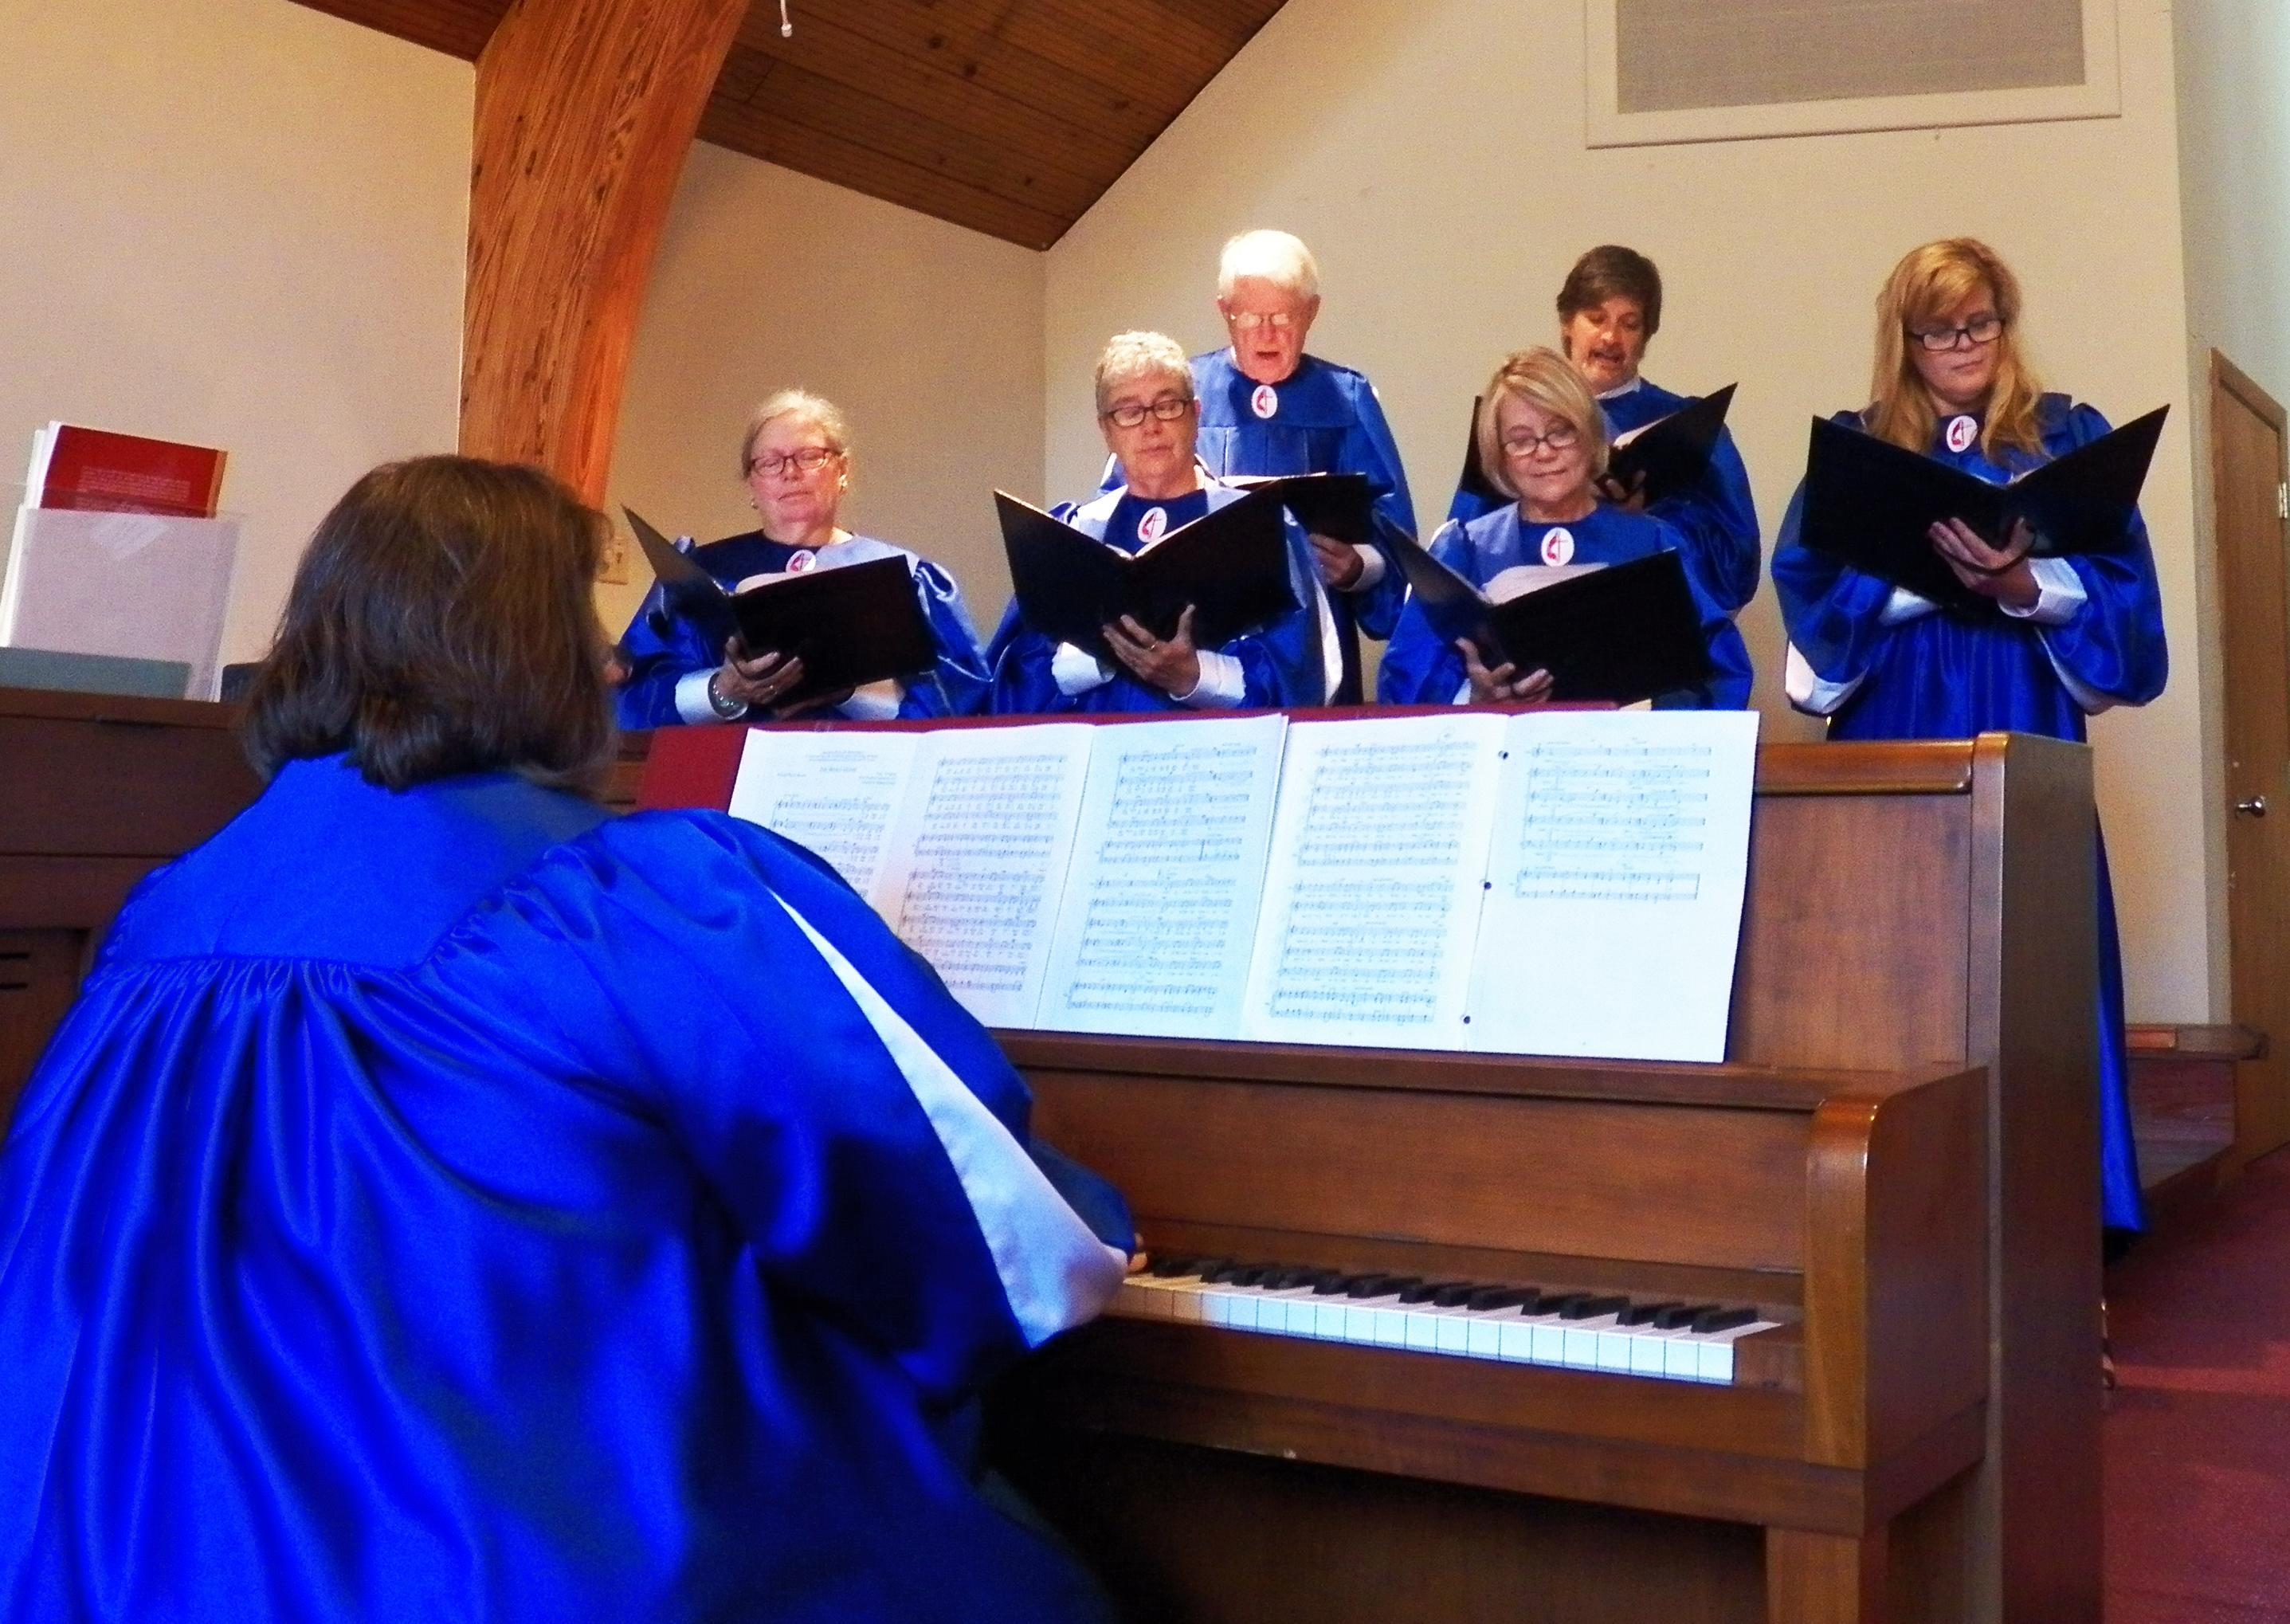 Welcome Back Sunday 2017 – Cape Elizabeth United Methodist Church